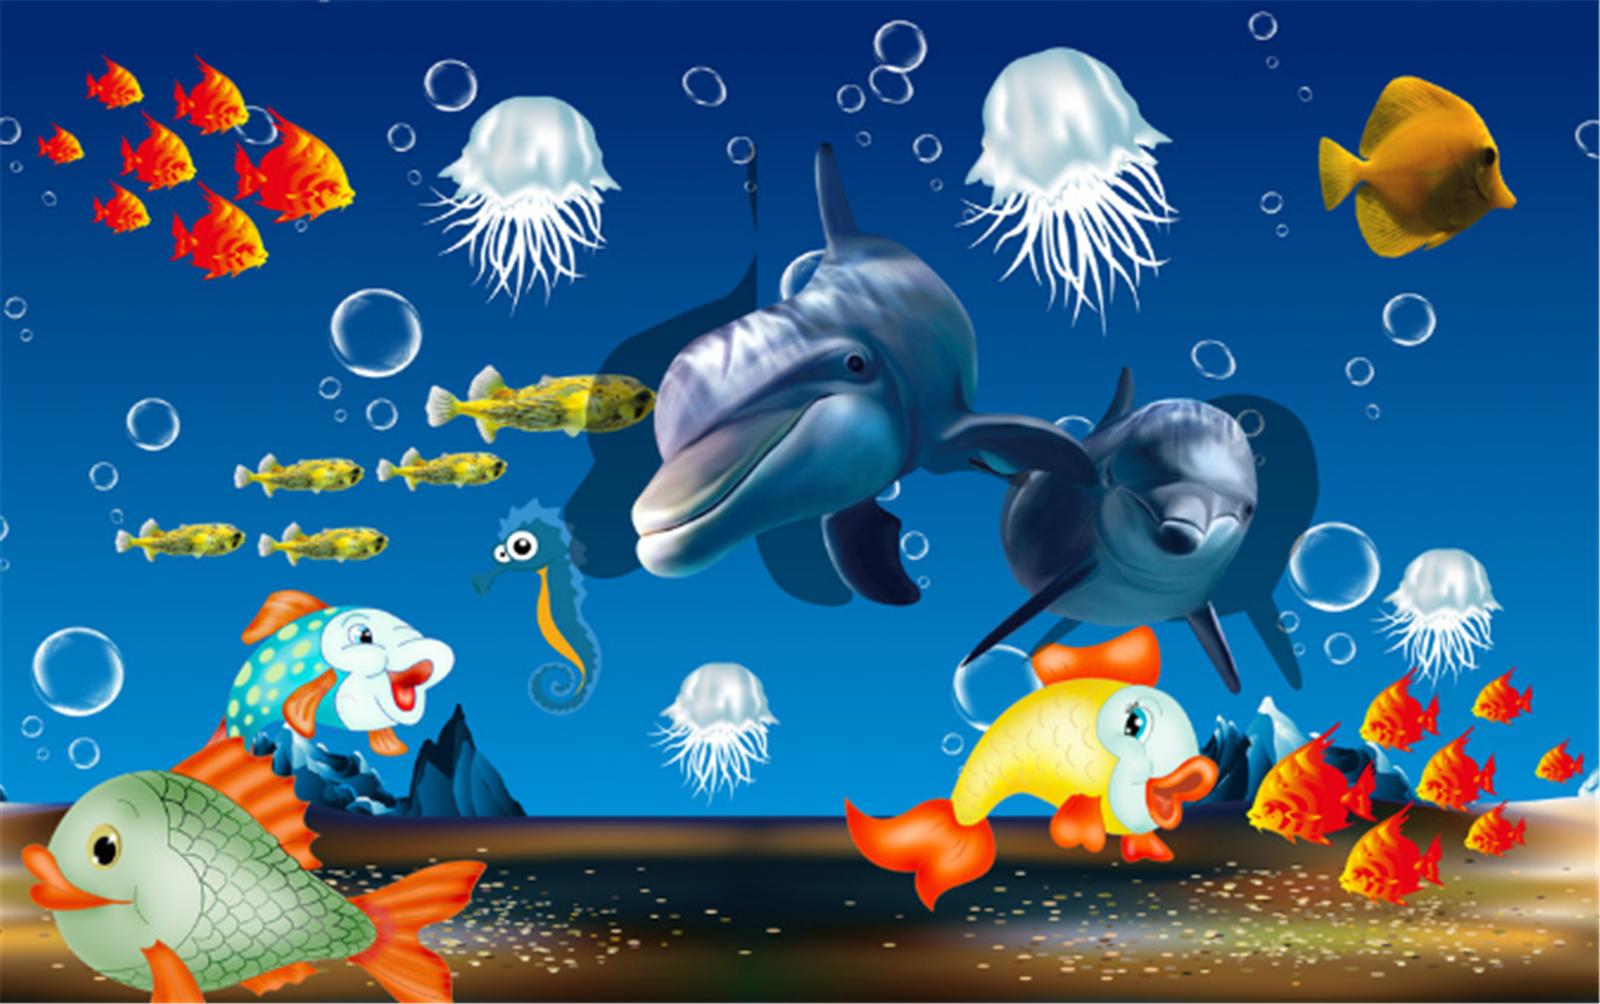 3D Karikatur Karikatur Karikatur Meer Tiere 7933 Tapete Wandgemälde Tapeten Bild Familie DE Lemon | Haltbar  | Perfekt In Verarbeitung  |  ae60c3